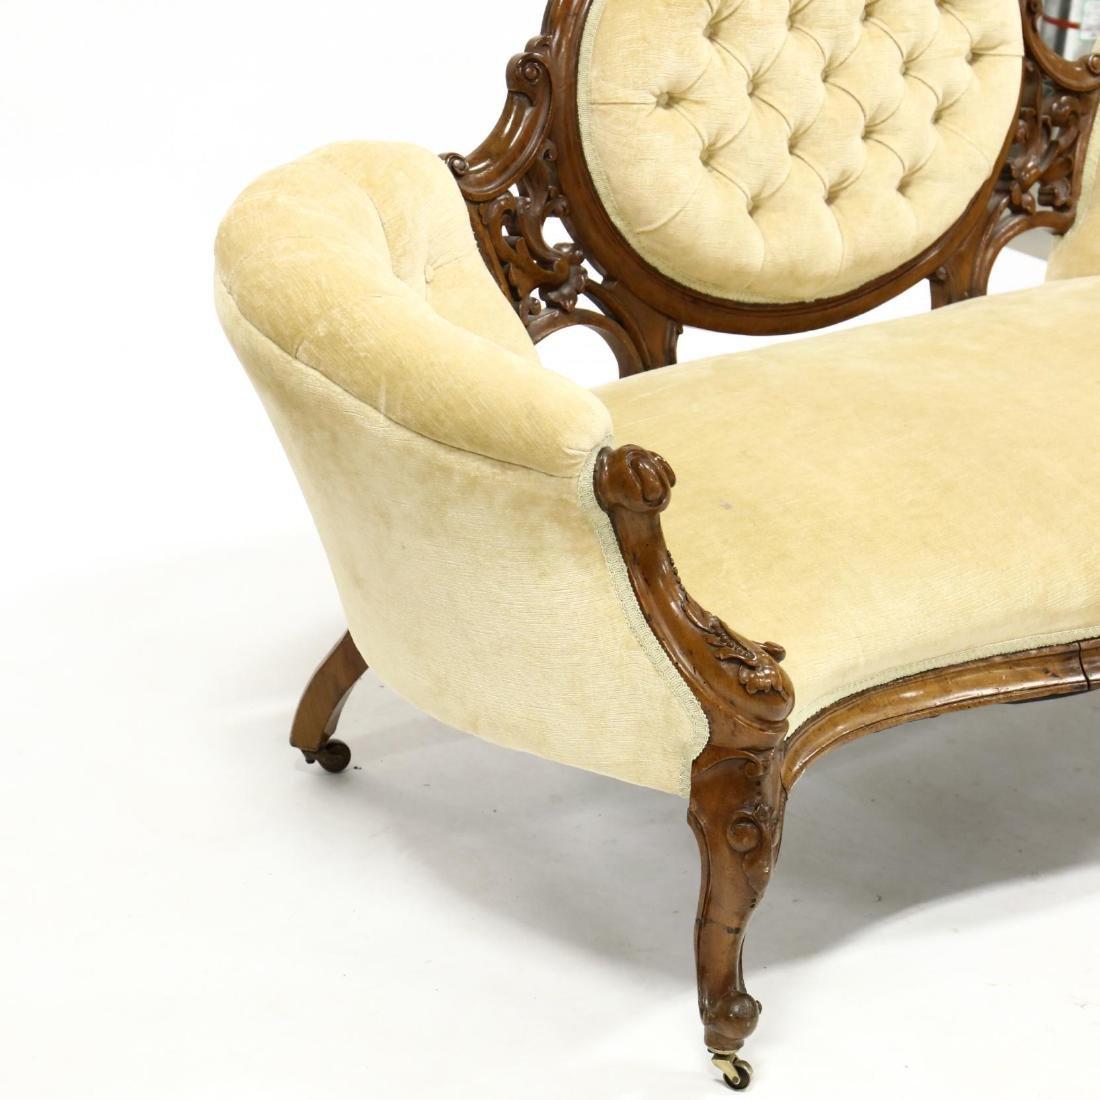 Rococo Revival Victorian Carved Walnut Sofa - 3